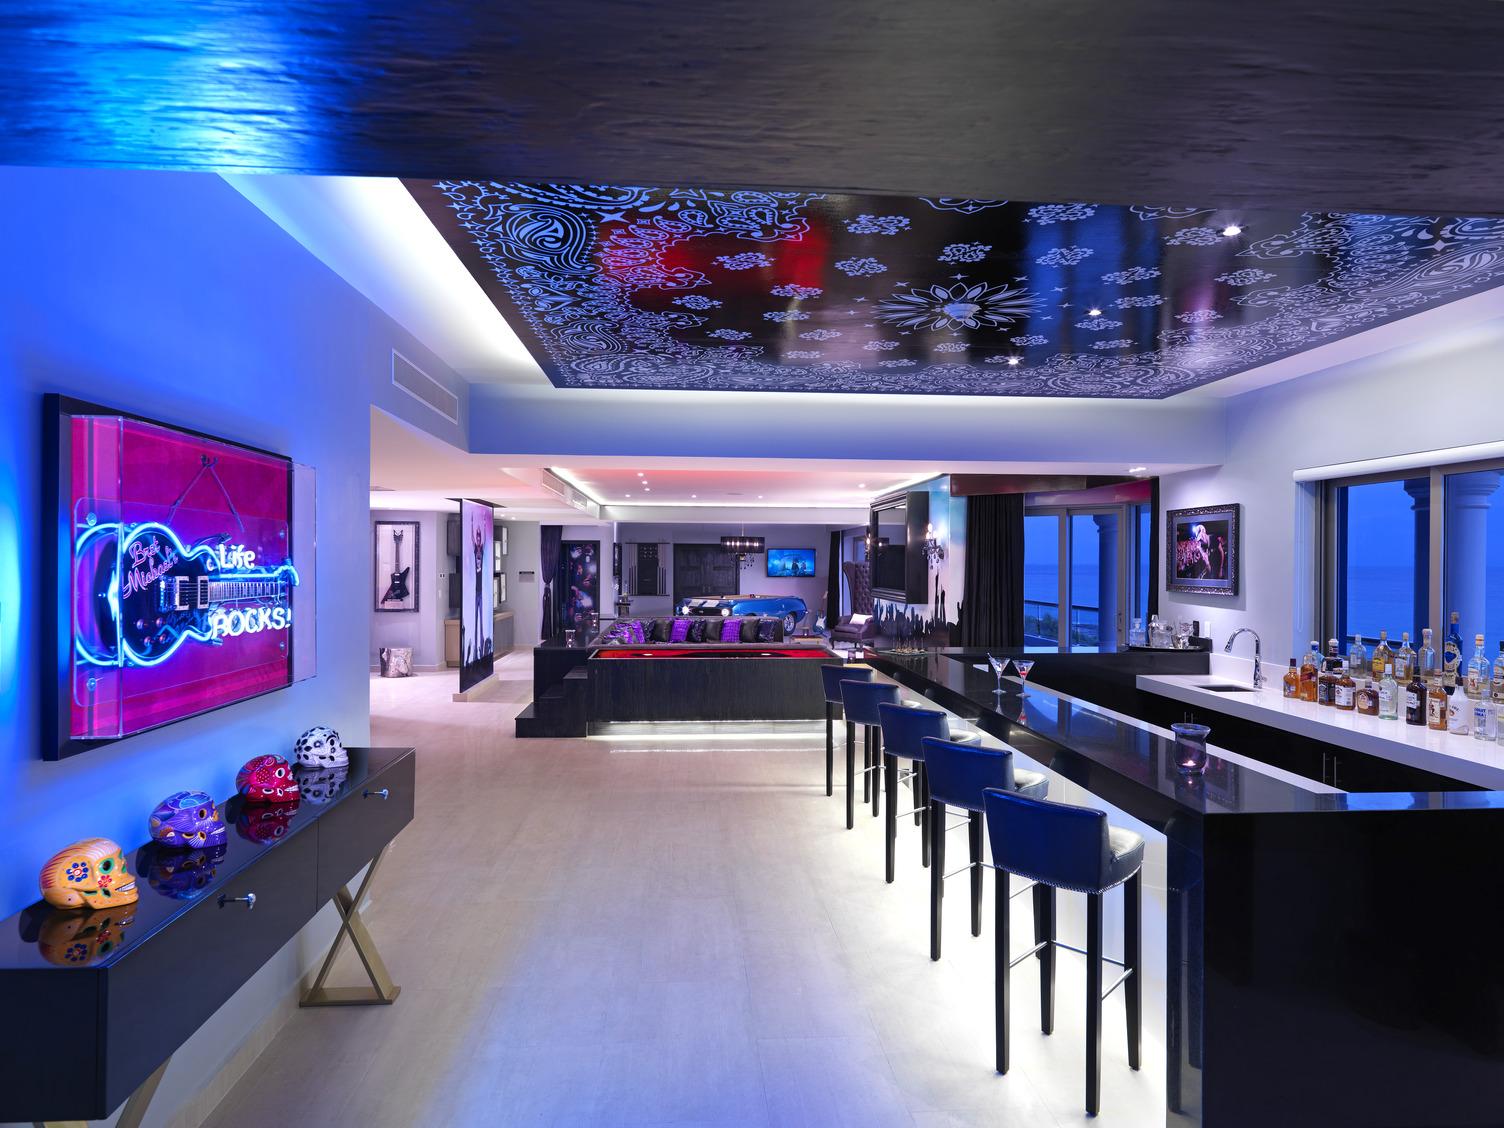 Travel Agency All-Inclusive Resort Heaven at Hard Rock Hotel Riviera Maya 25